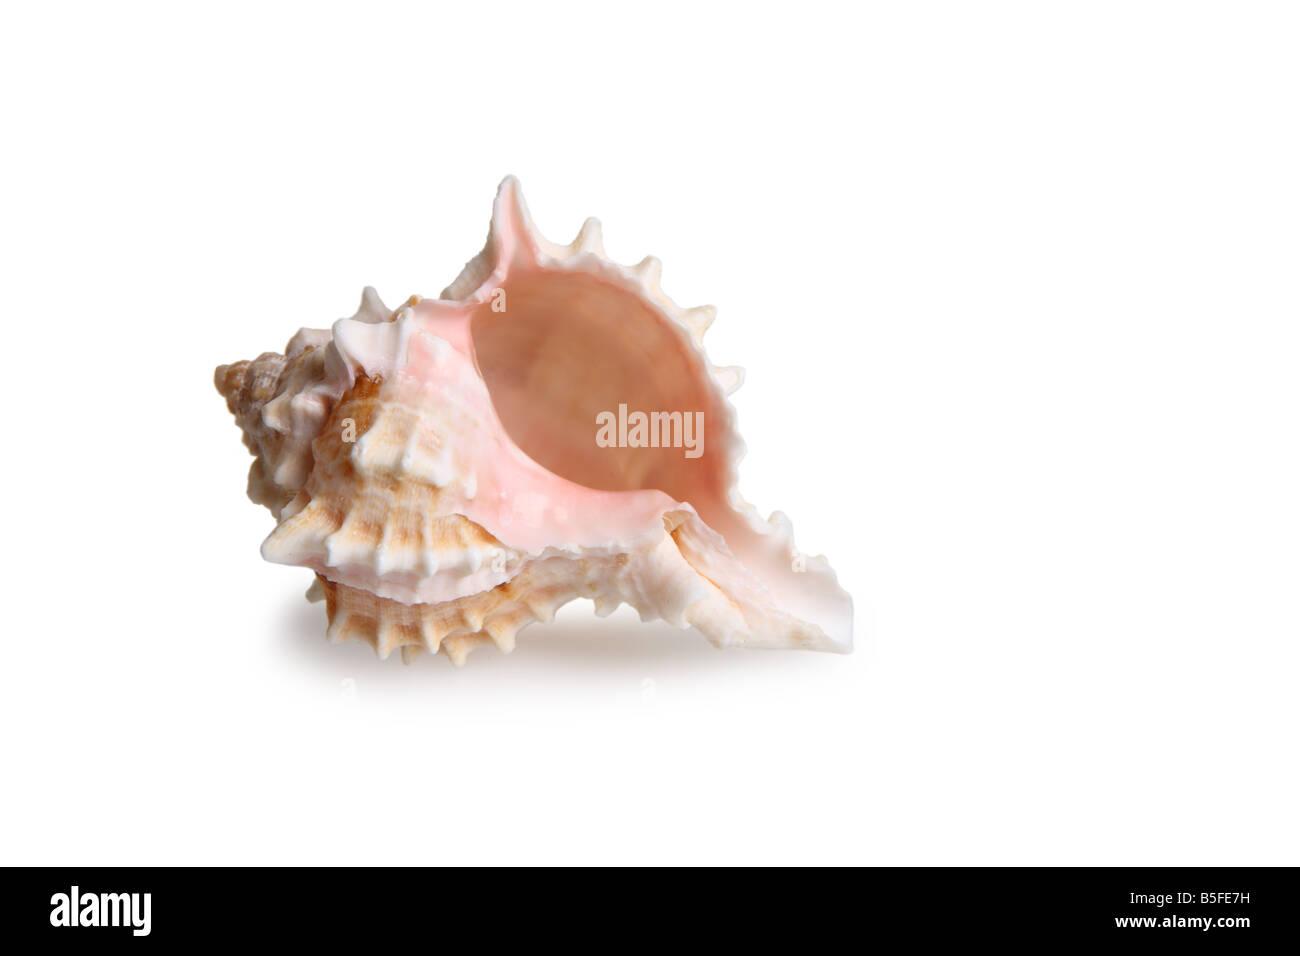 Recorte de Shell sobre fondo blanco. Imagen De Stock